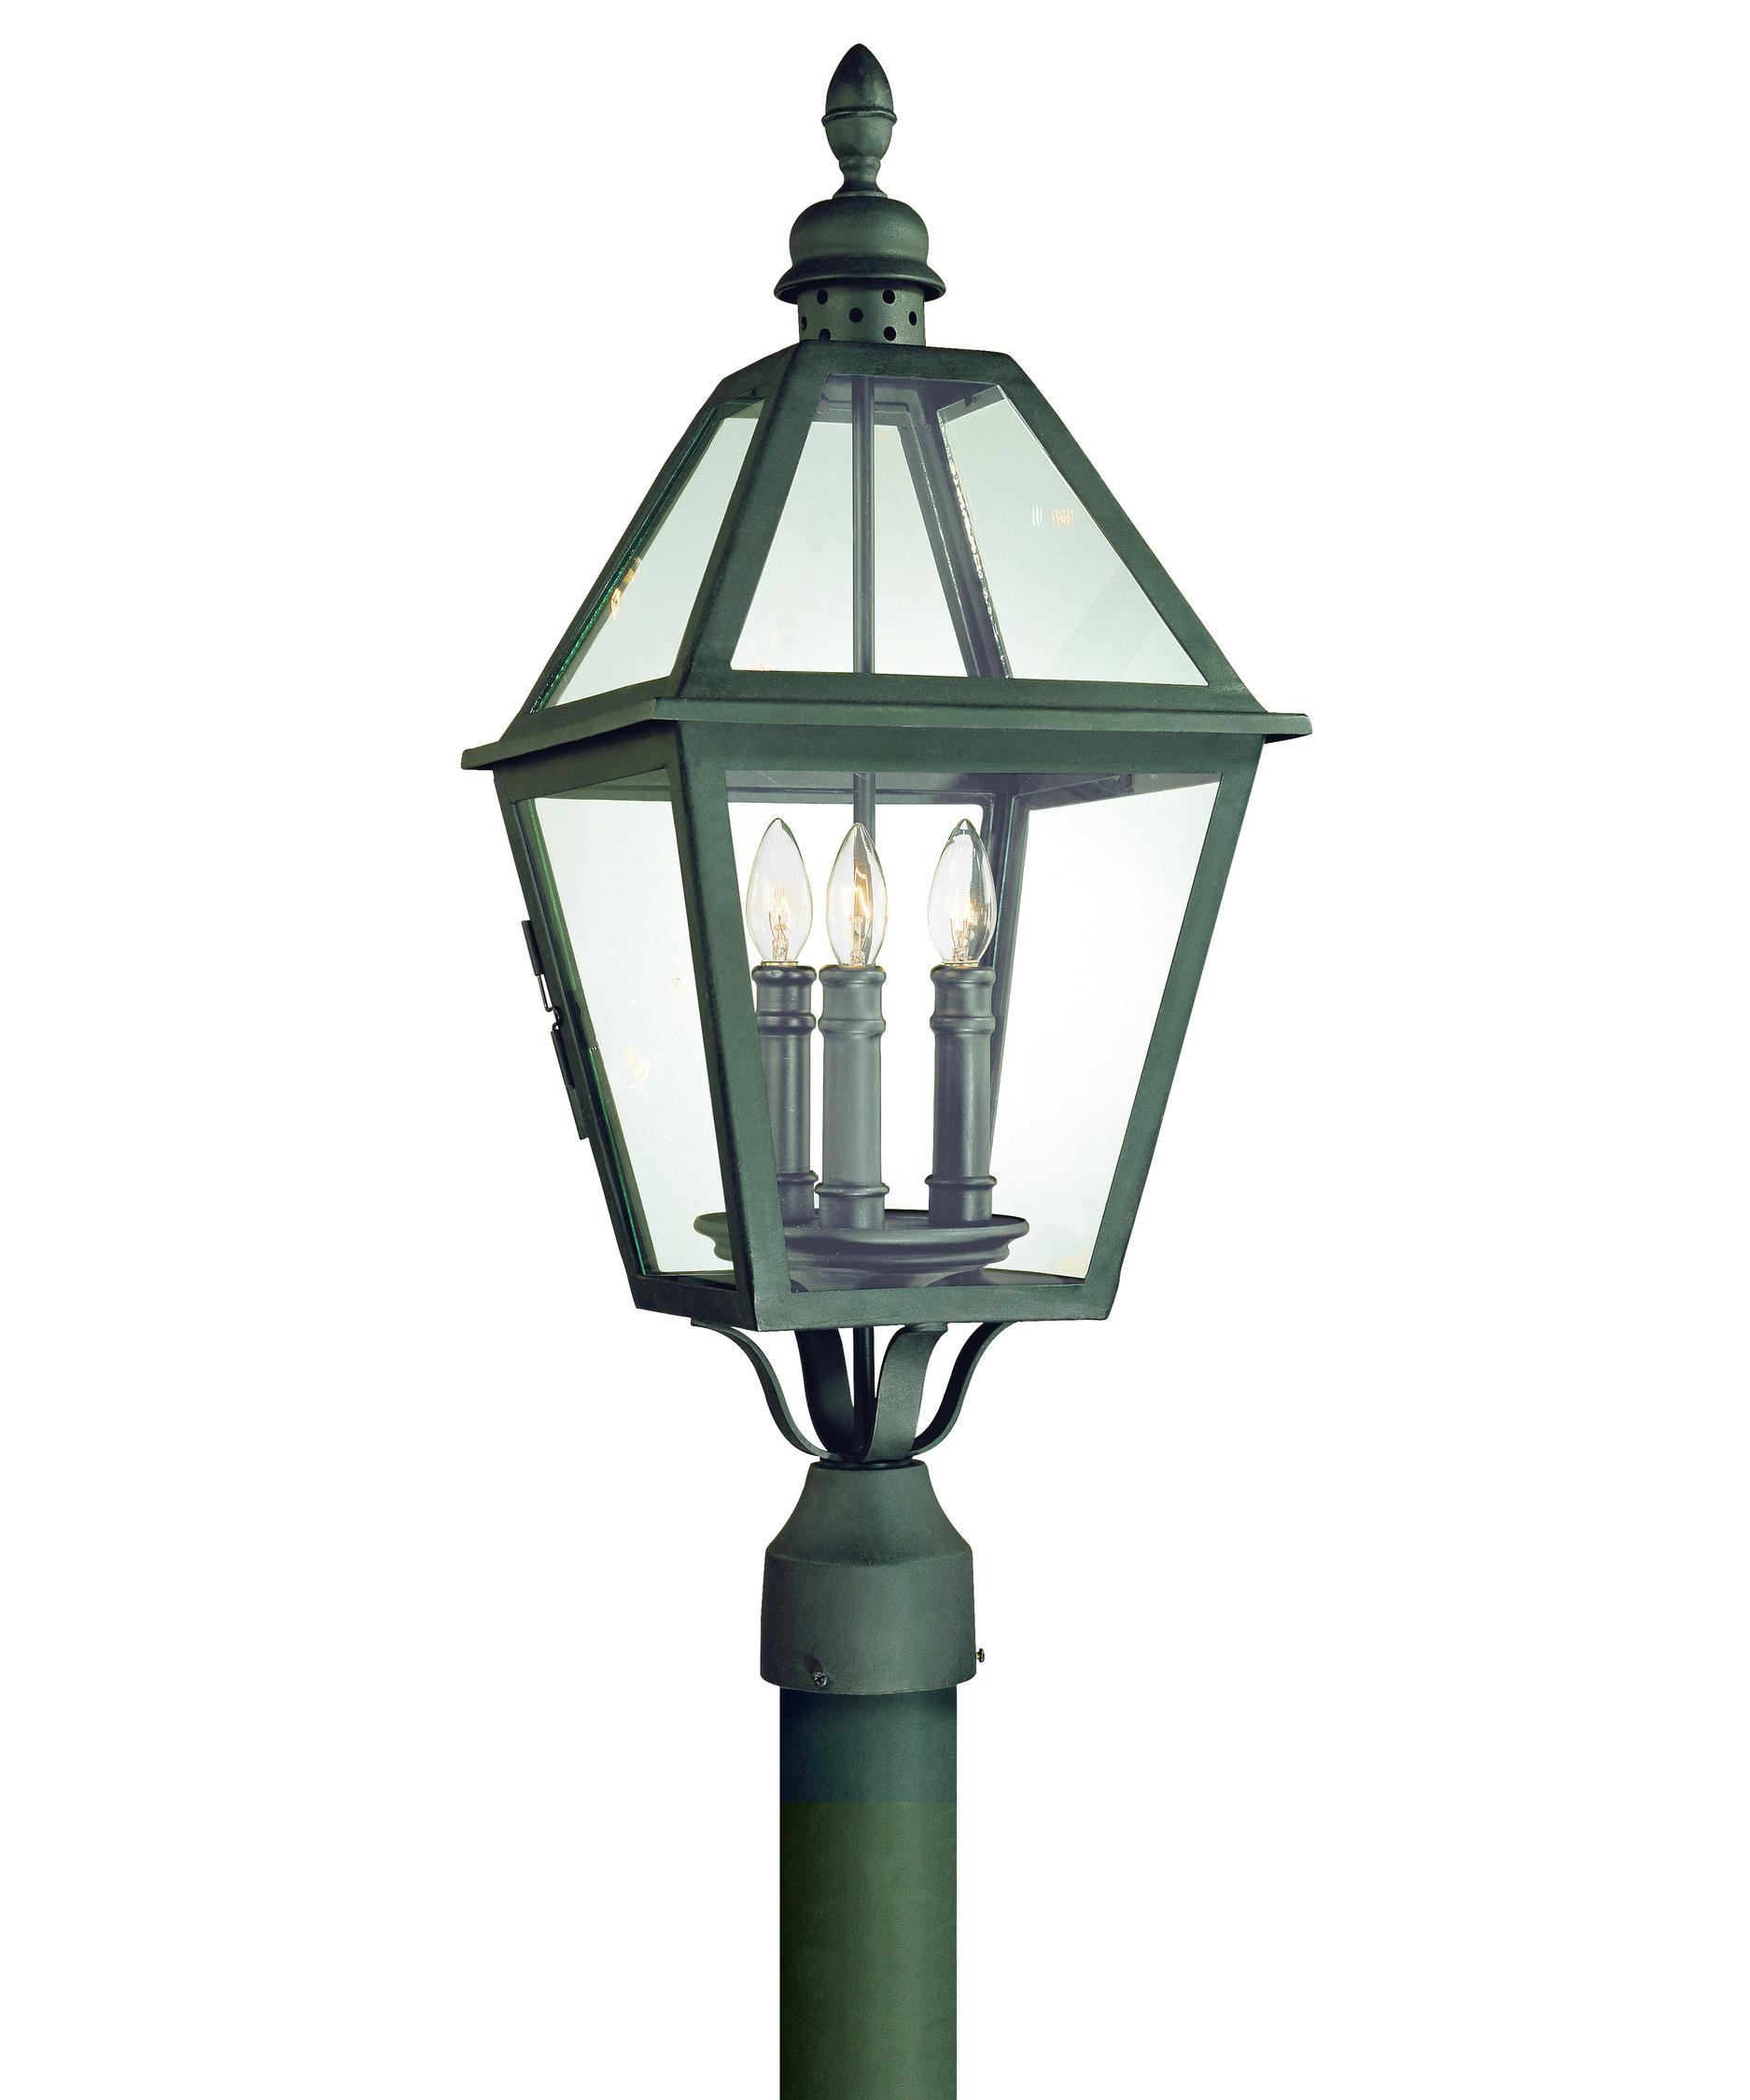 troy lighting p9625 townsend 3 light outdoor post lamp. Black Bedroom Furniture Sets. Home Design Ideas